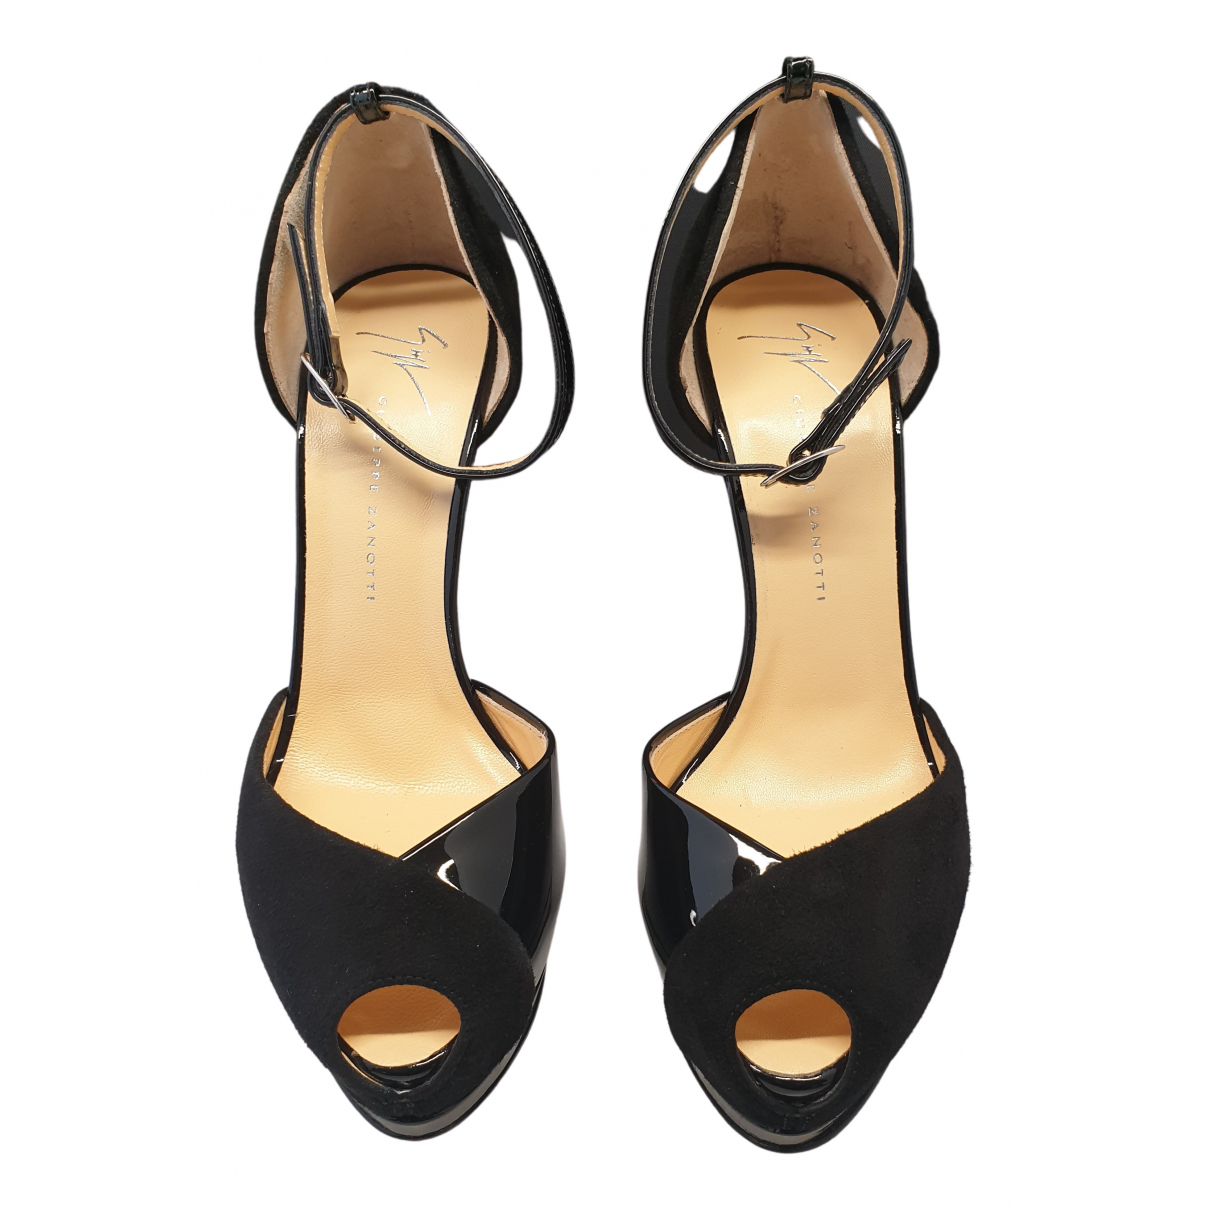 Giuseppe Zanotti N Black Leather Sandals for Women 37 EU